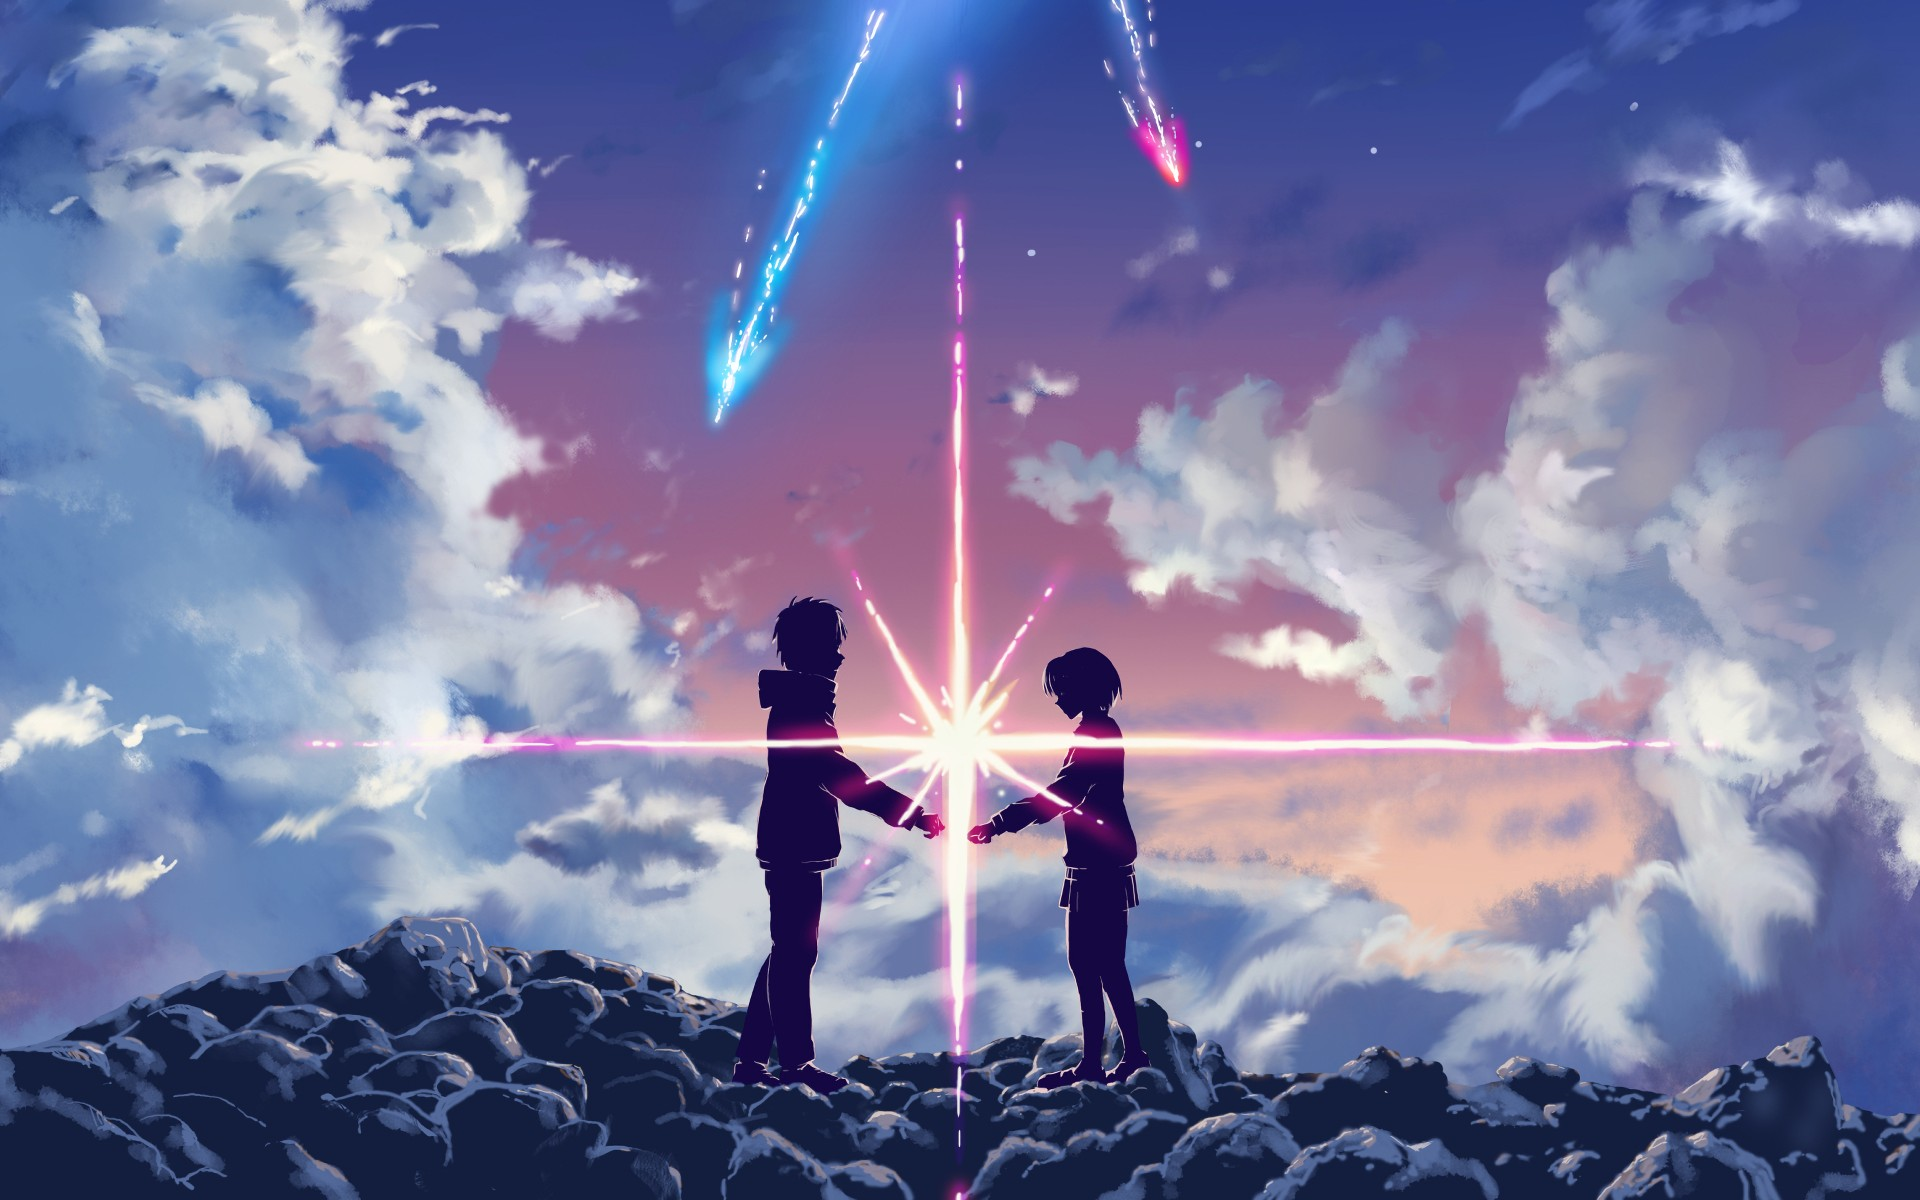 kimi no na wa wallpaper ·① download free stunning high resolution